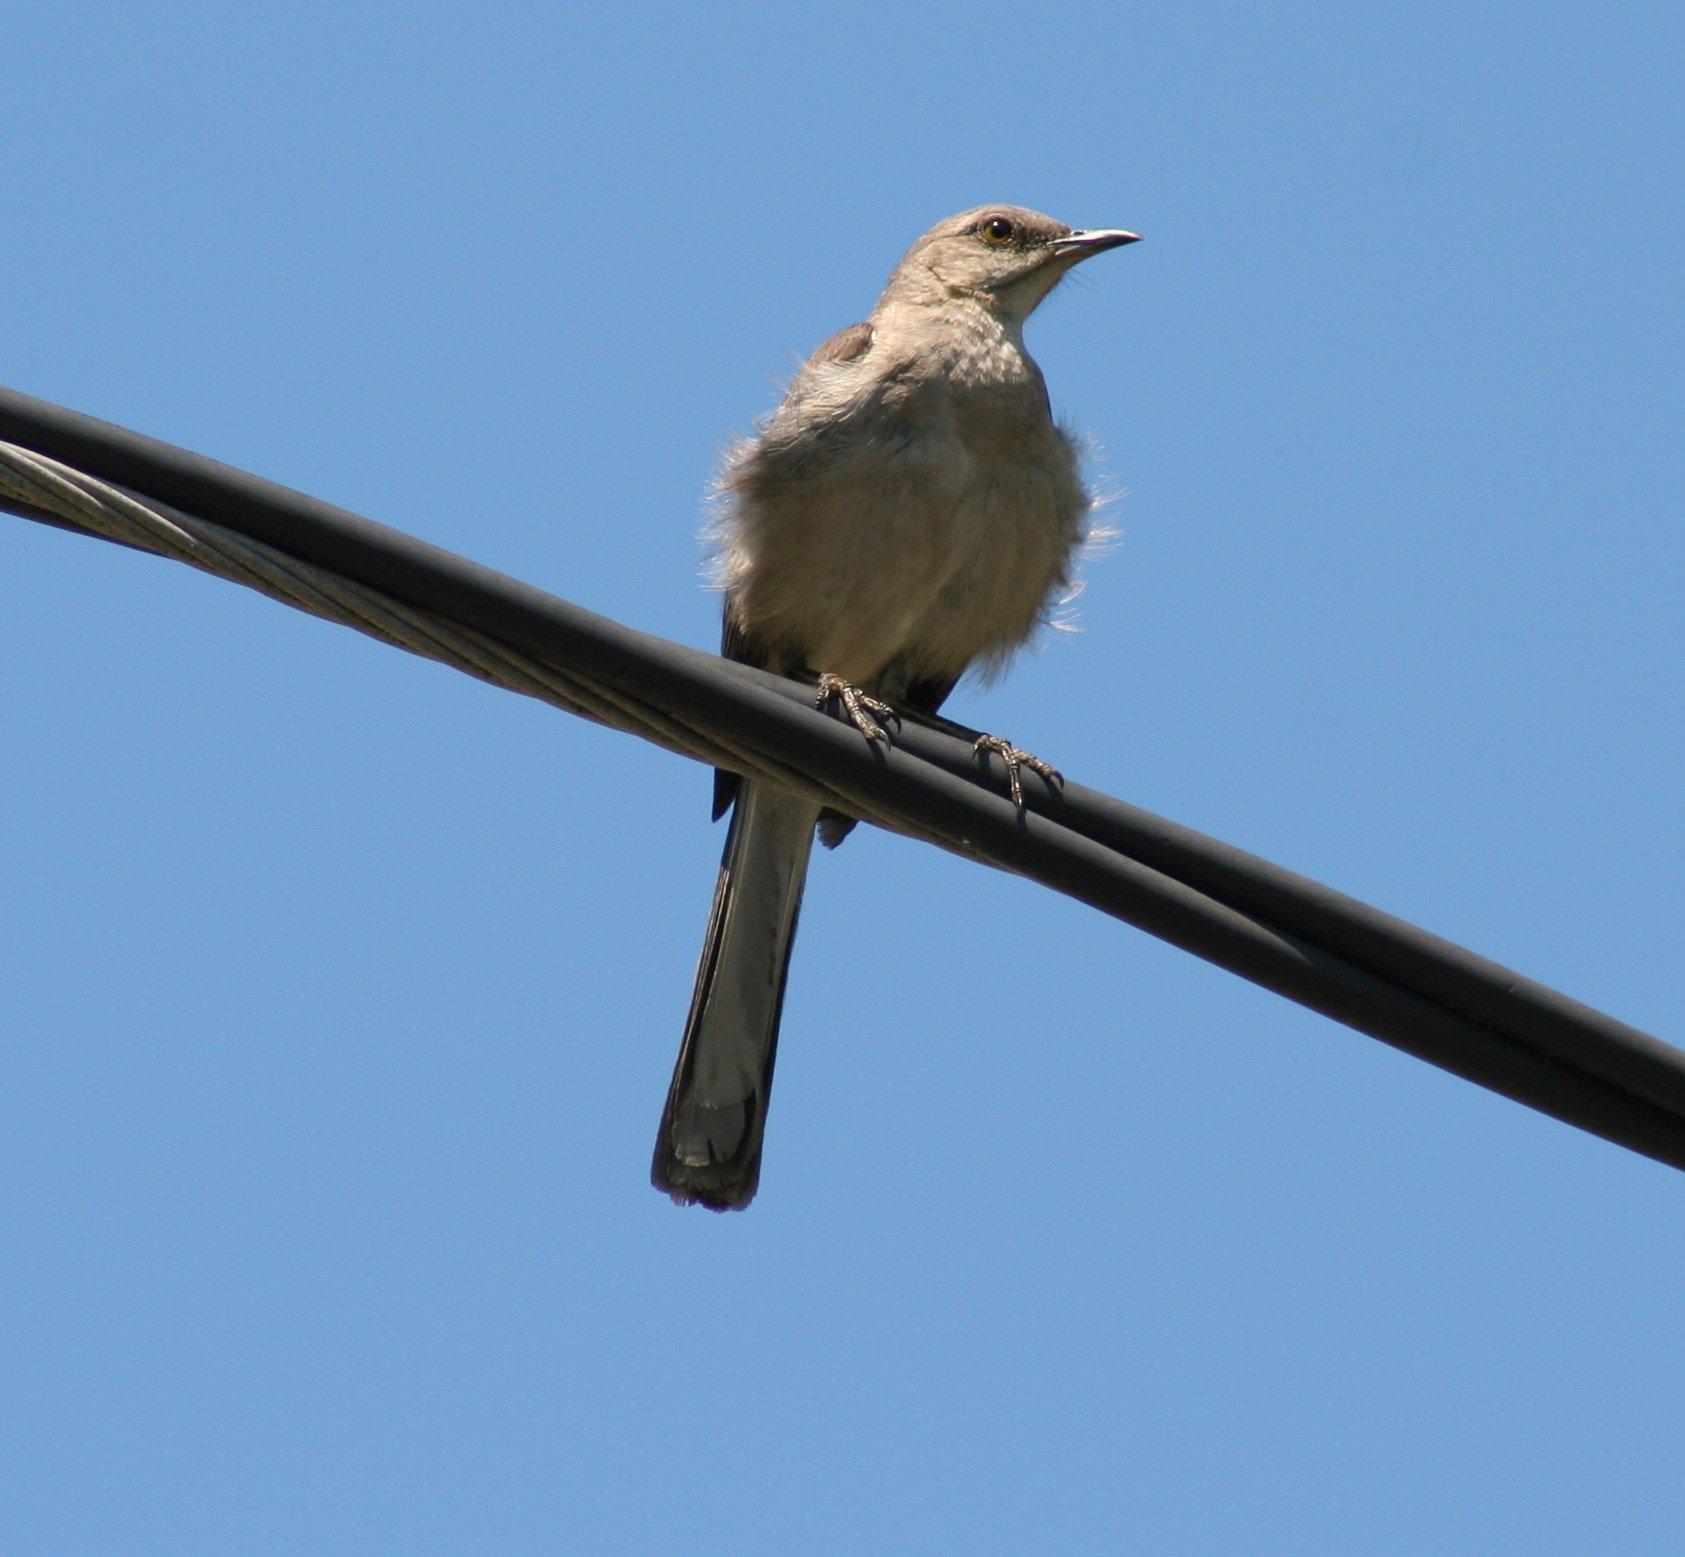 File:Bird on a Wire (3690480985).jpg - Wikimedia Commons